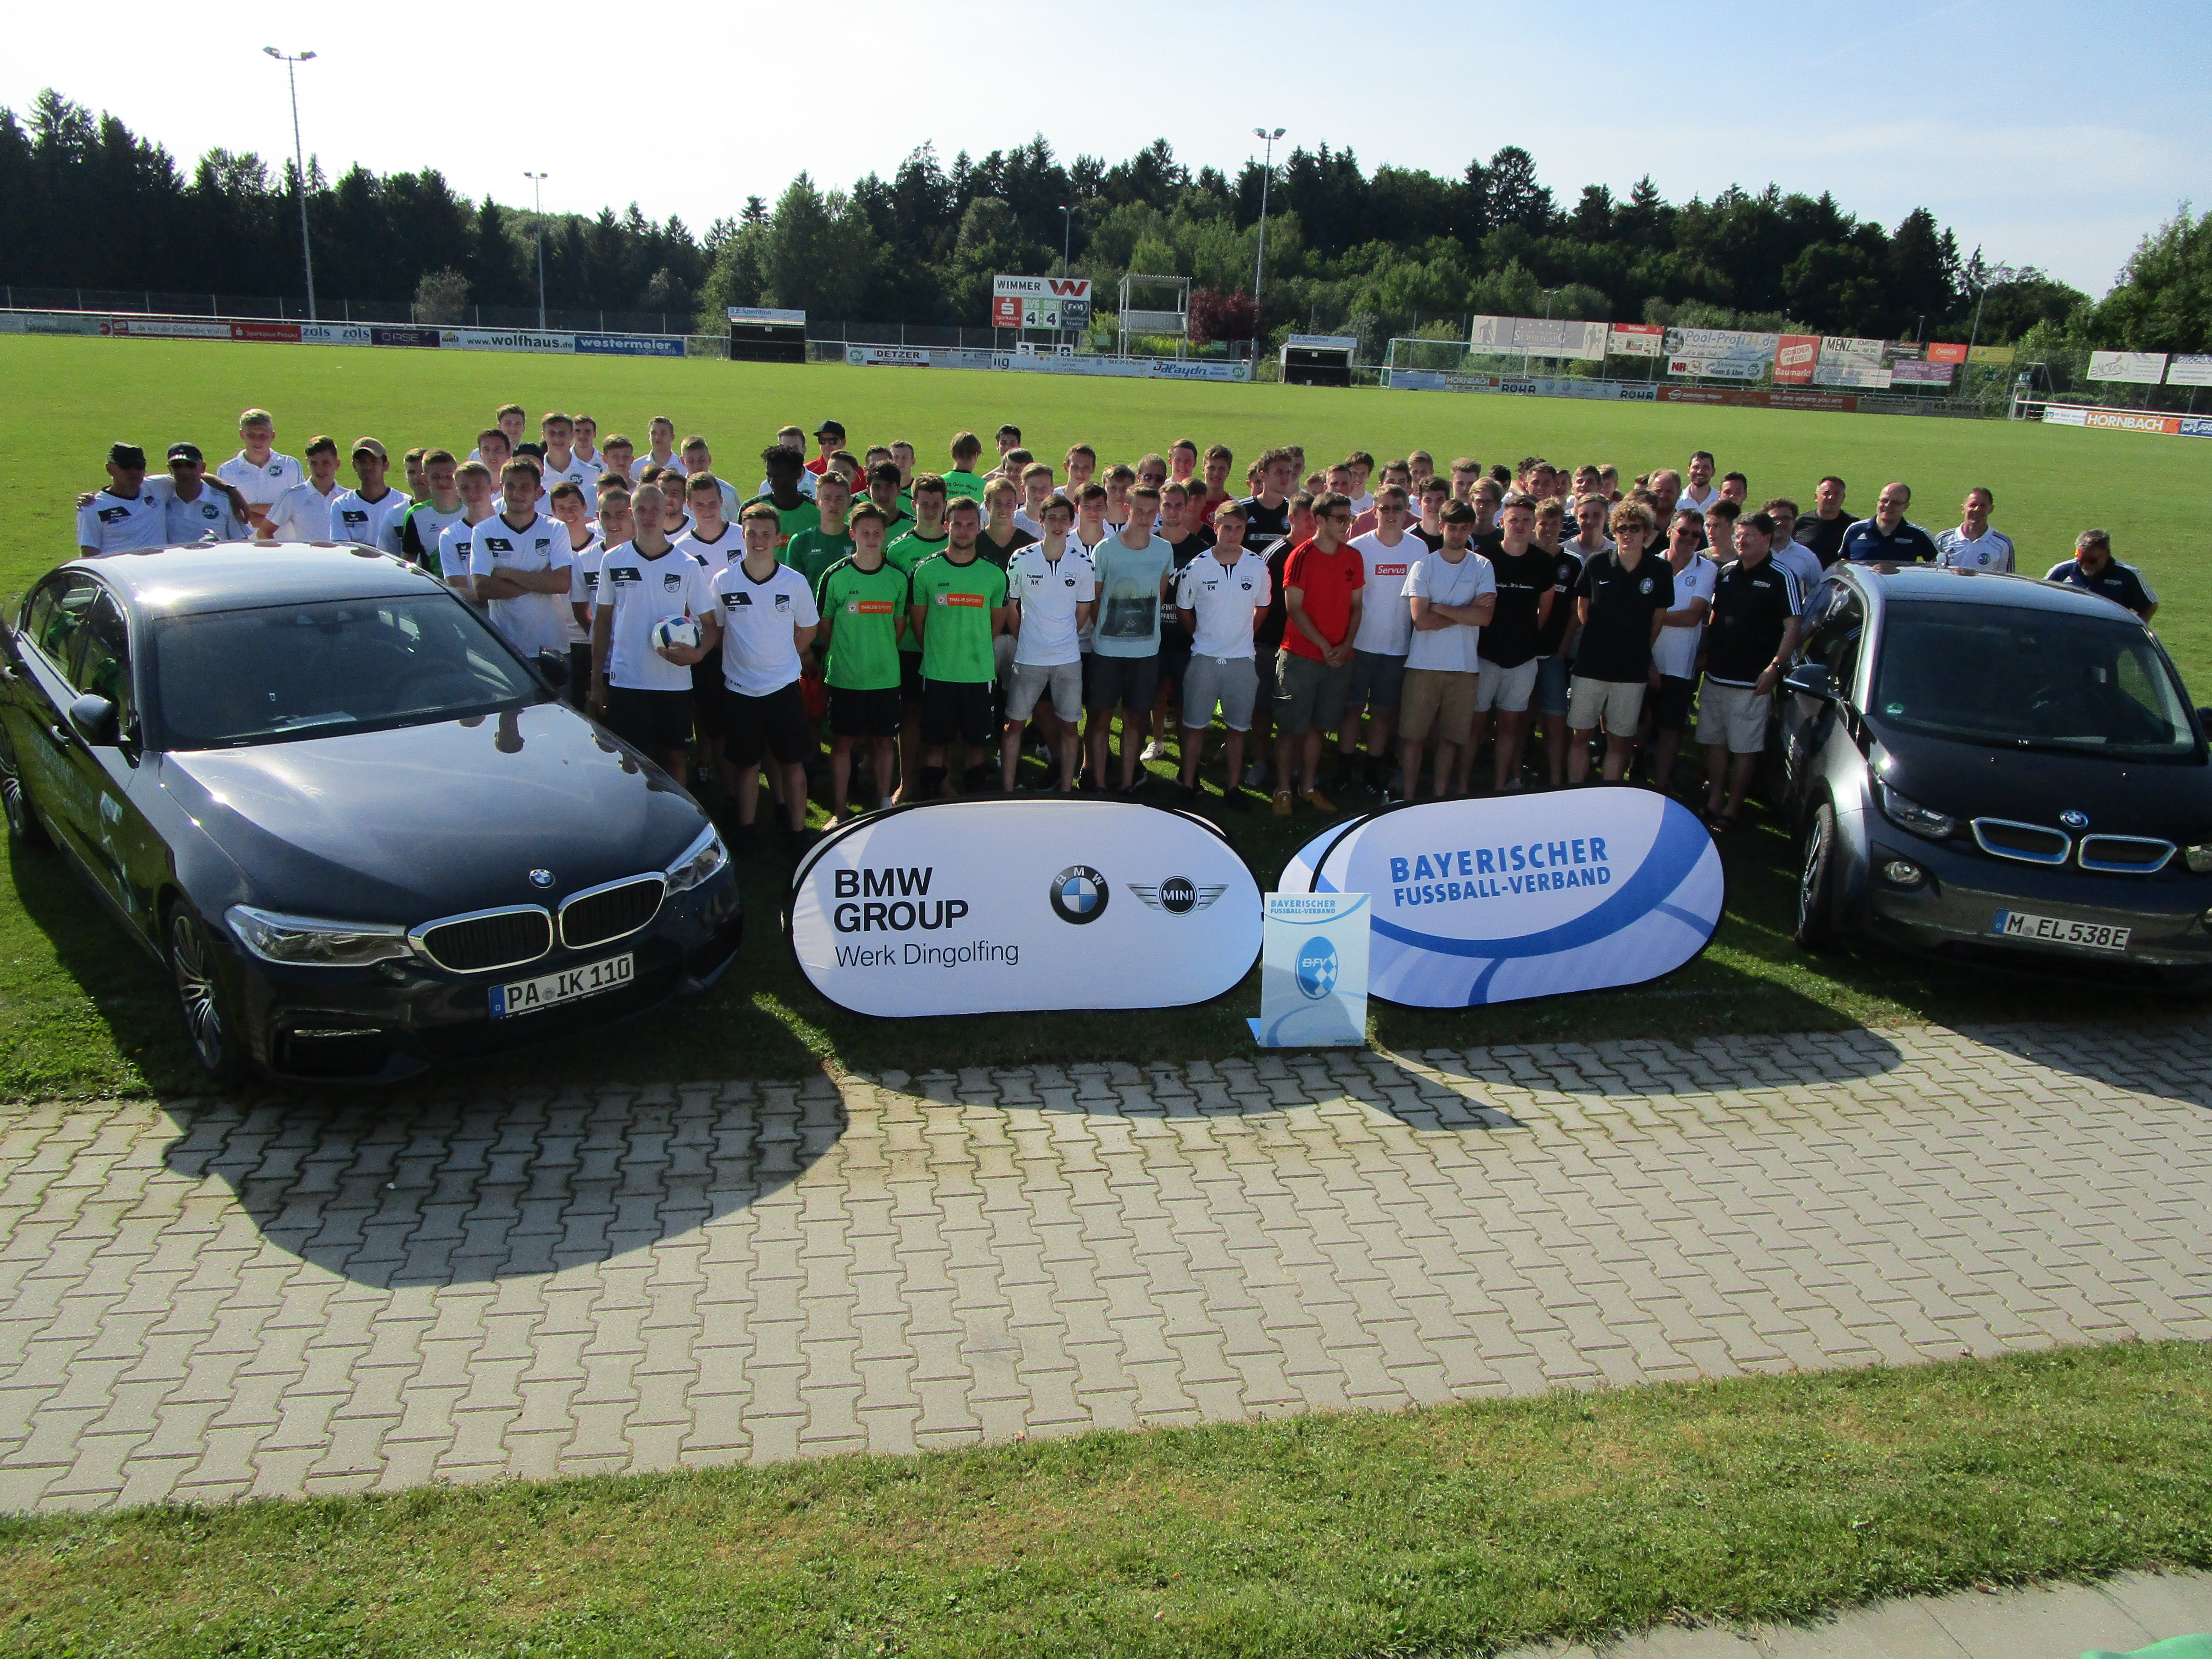 <a class=&quot;amazingslider-posttitle-link&quot; href=&quot;http://www.svs-passau.de/bmw-cup-wir-sagen-danke&quot;>U19 BMW-Cup-2018 findet in Schalding statt</a>